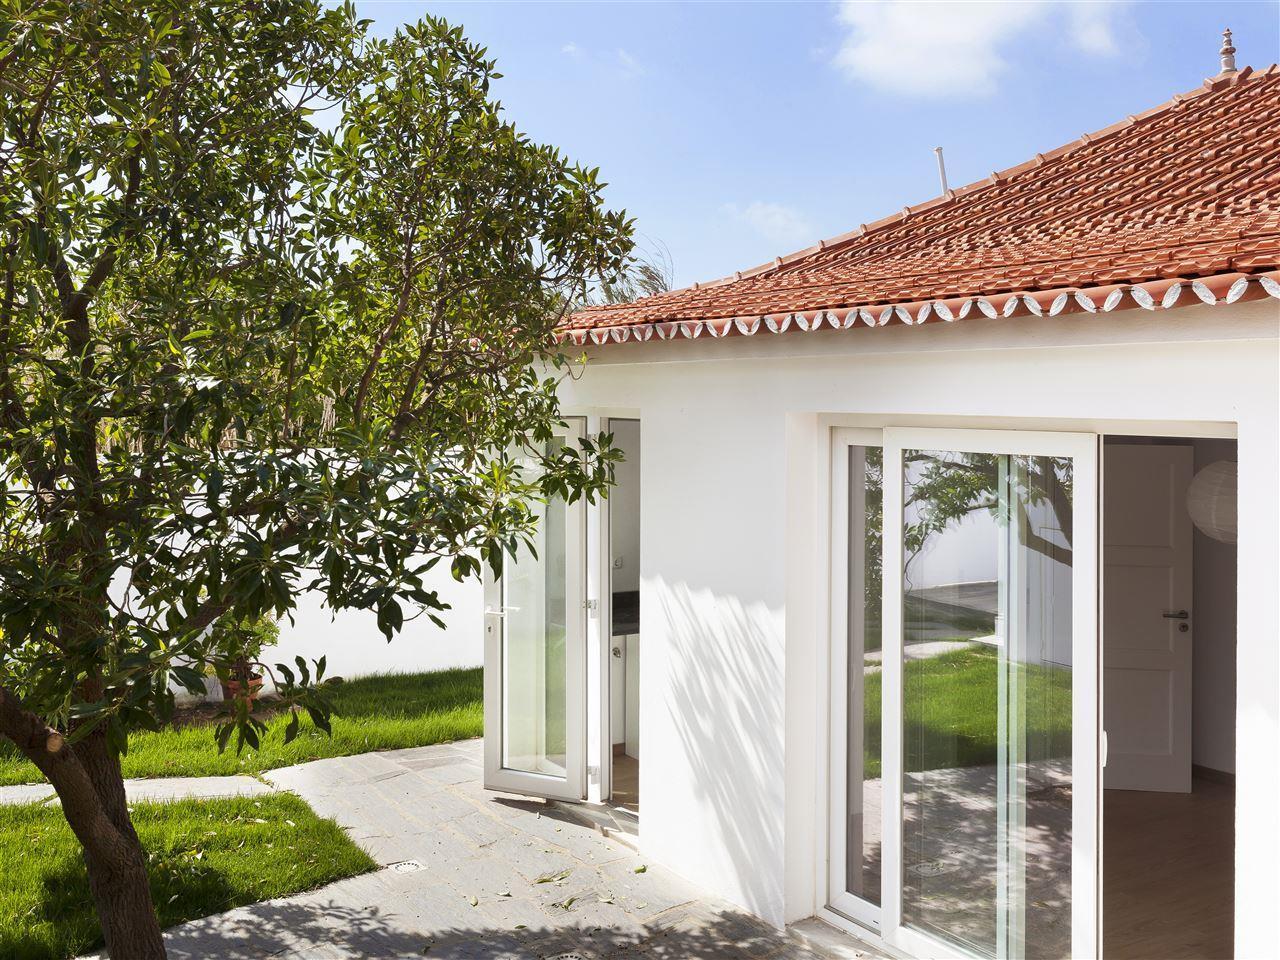 Moradia para Venda às Detached house, 2 bedrooms, for Sale Azoia, Sintra, Lisboa Portugal